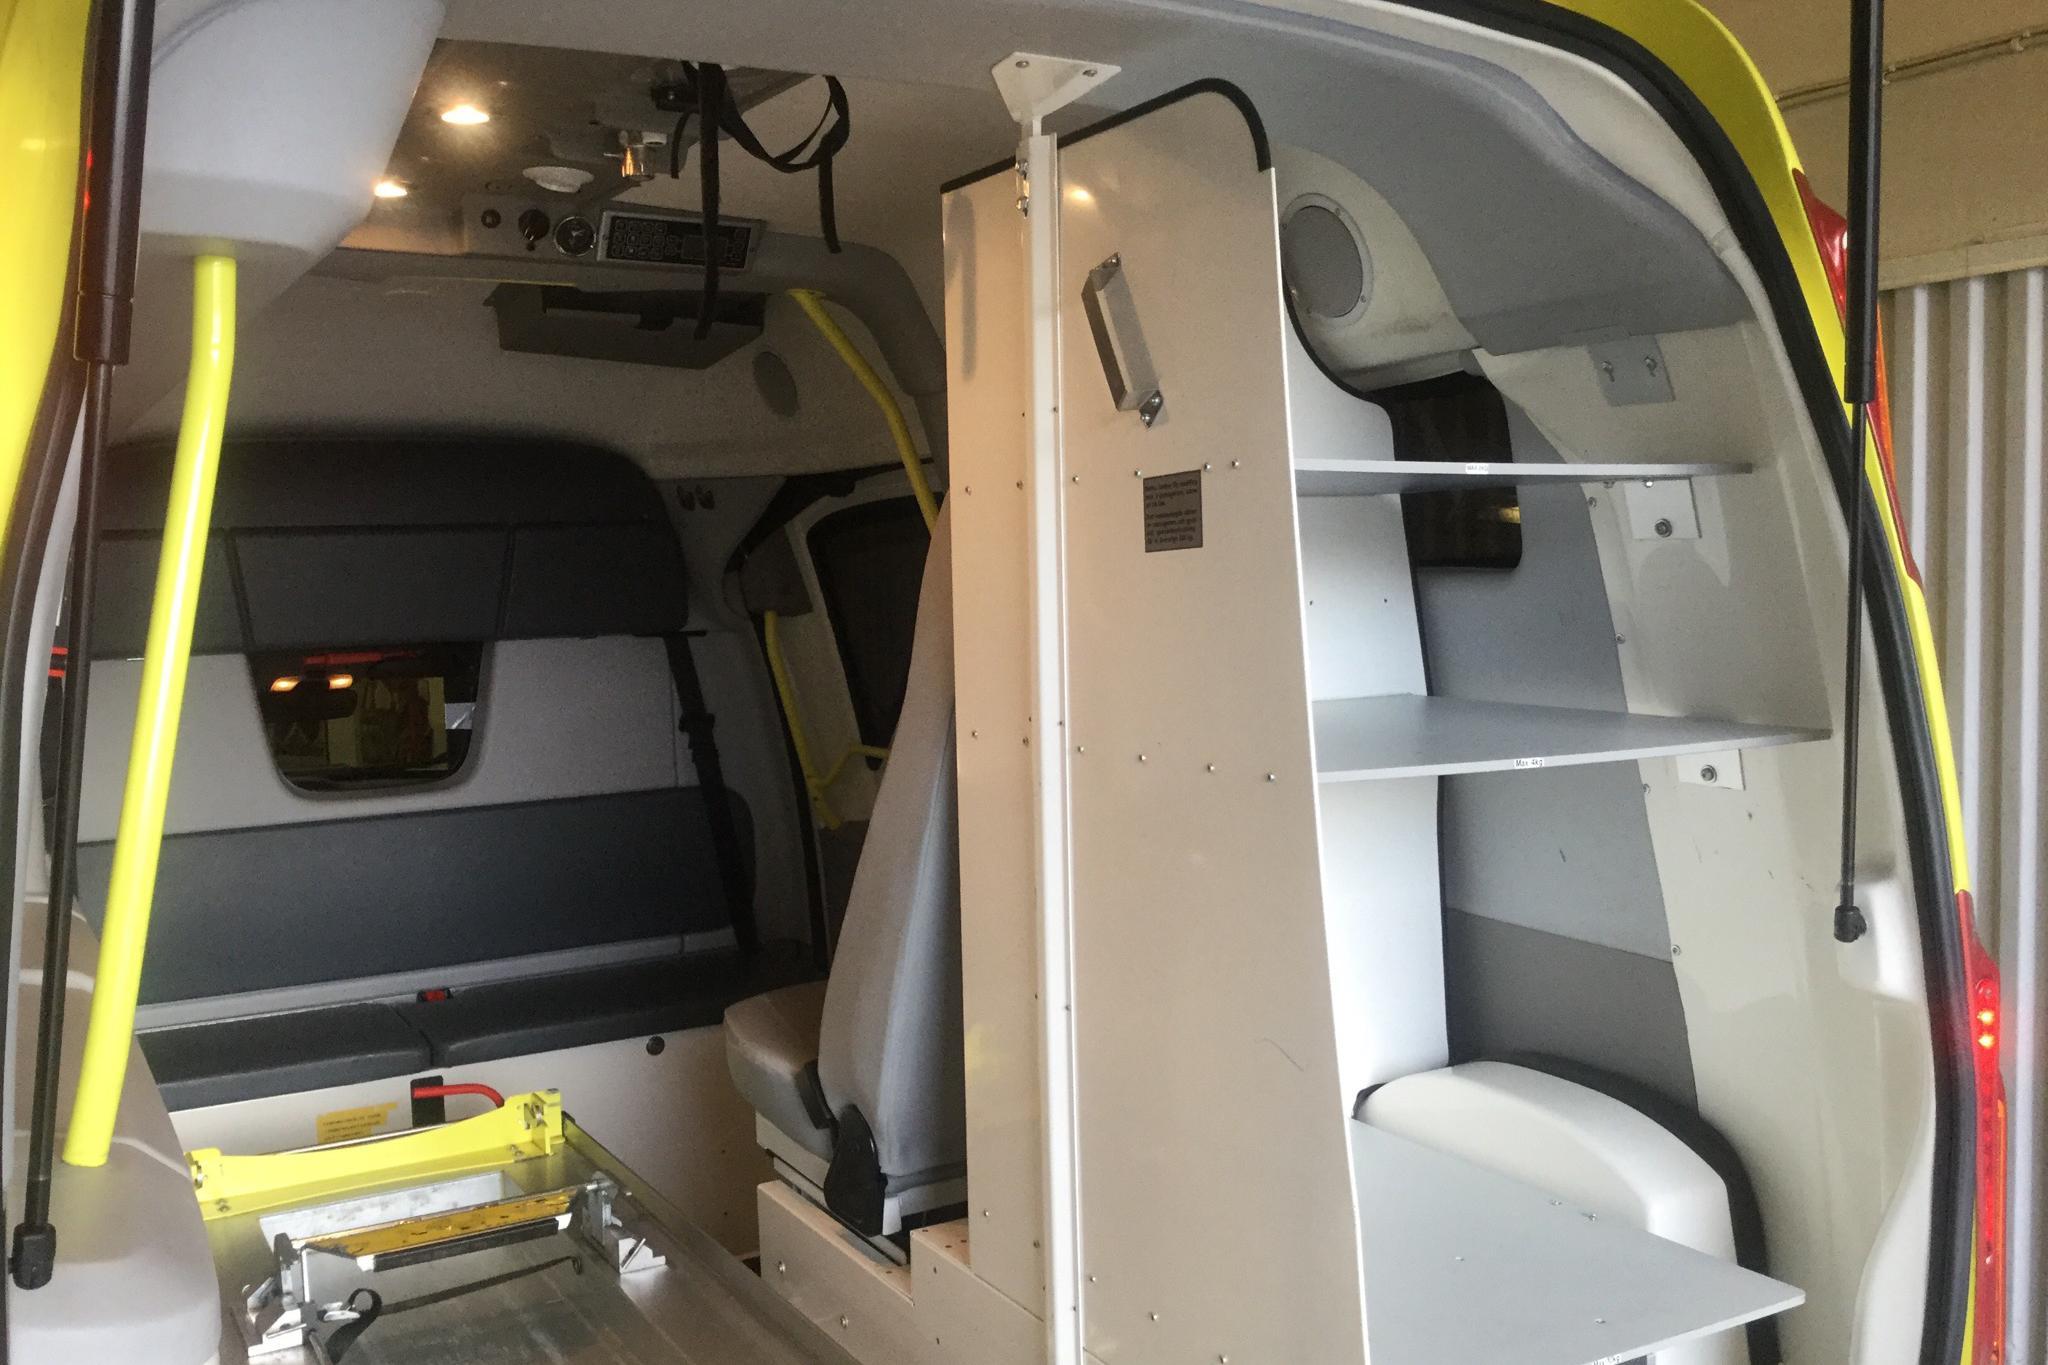 Volvo V70 D5 AWD Ambulans (215hk) - 0 km - Automatic - Multicolored